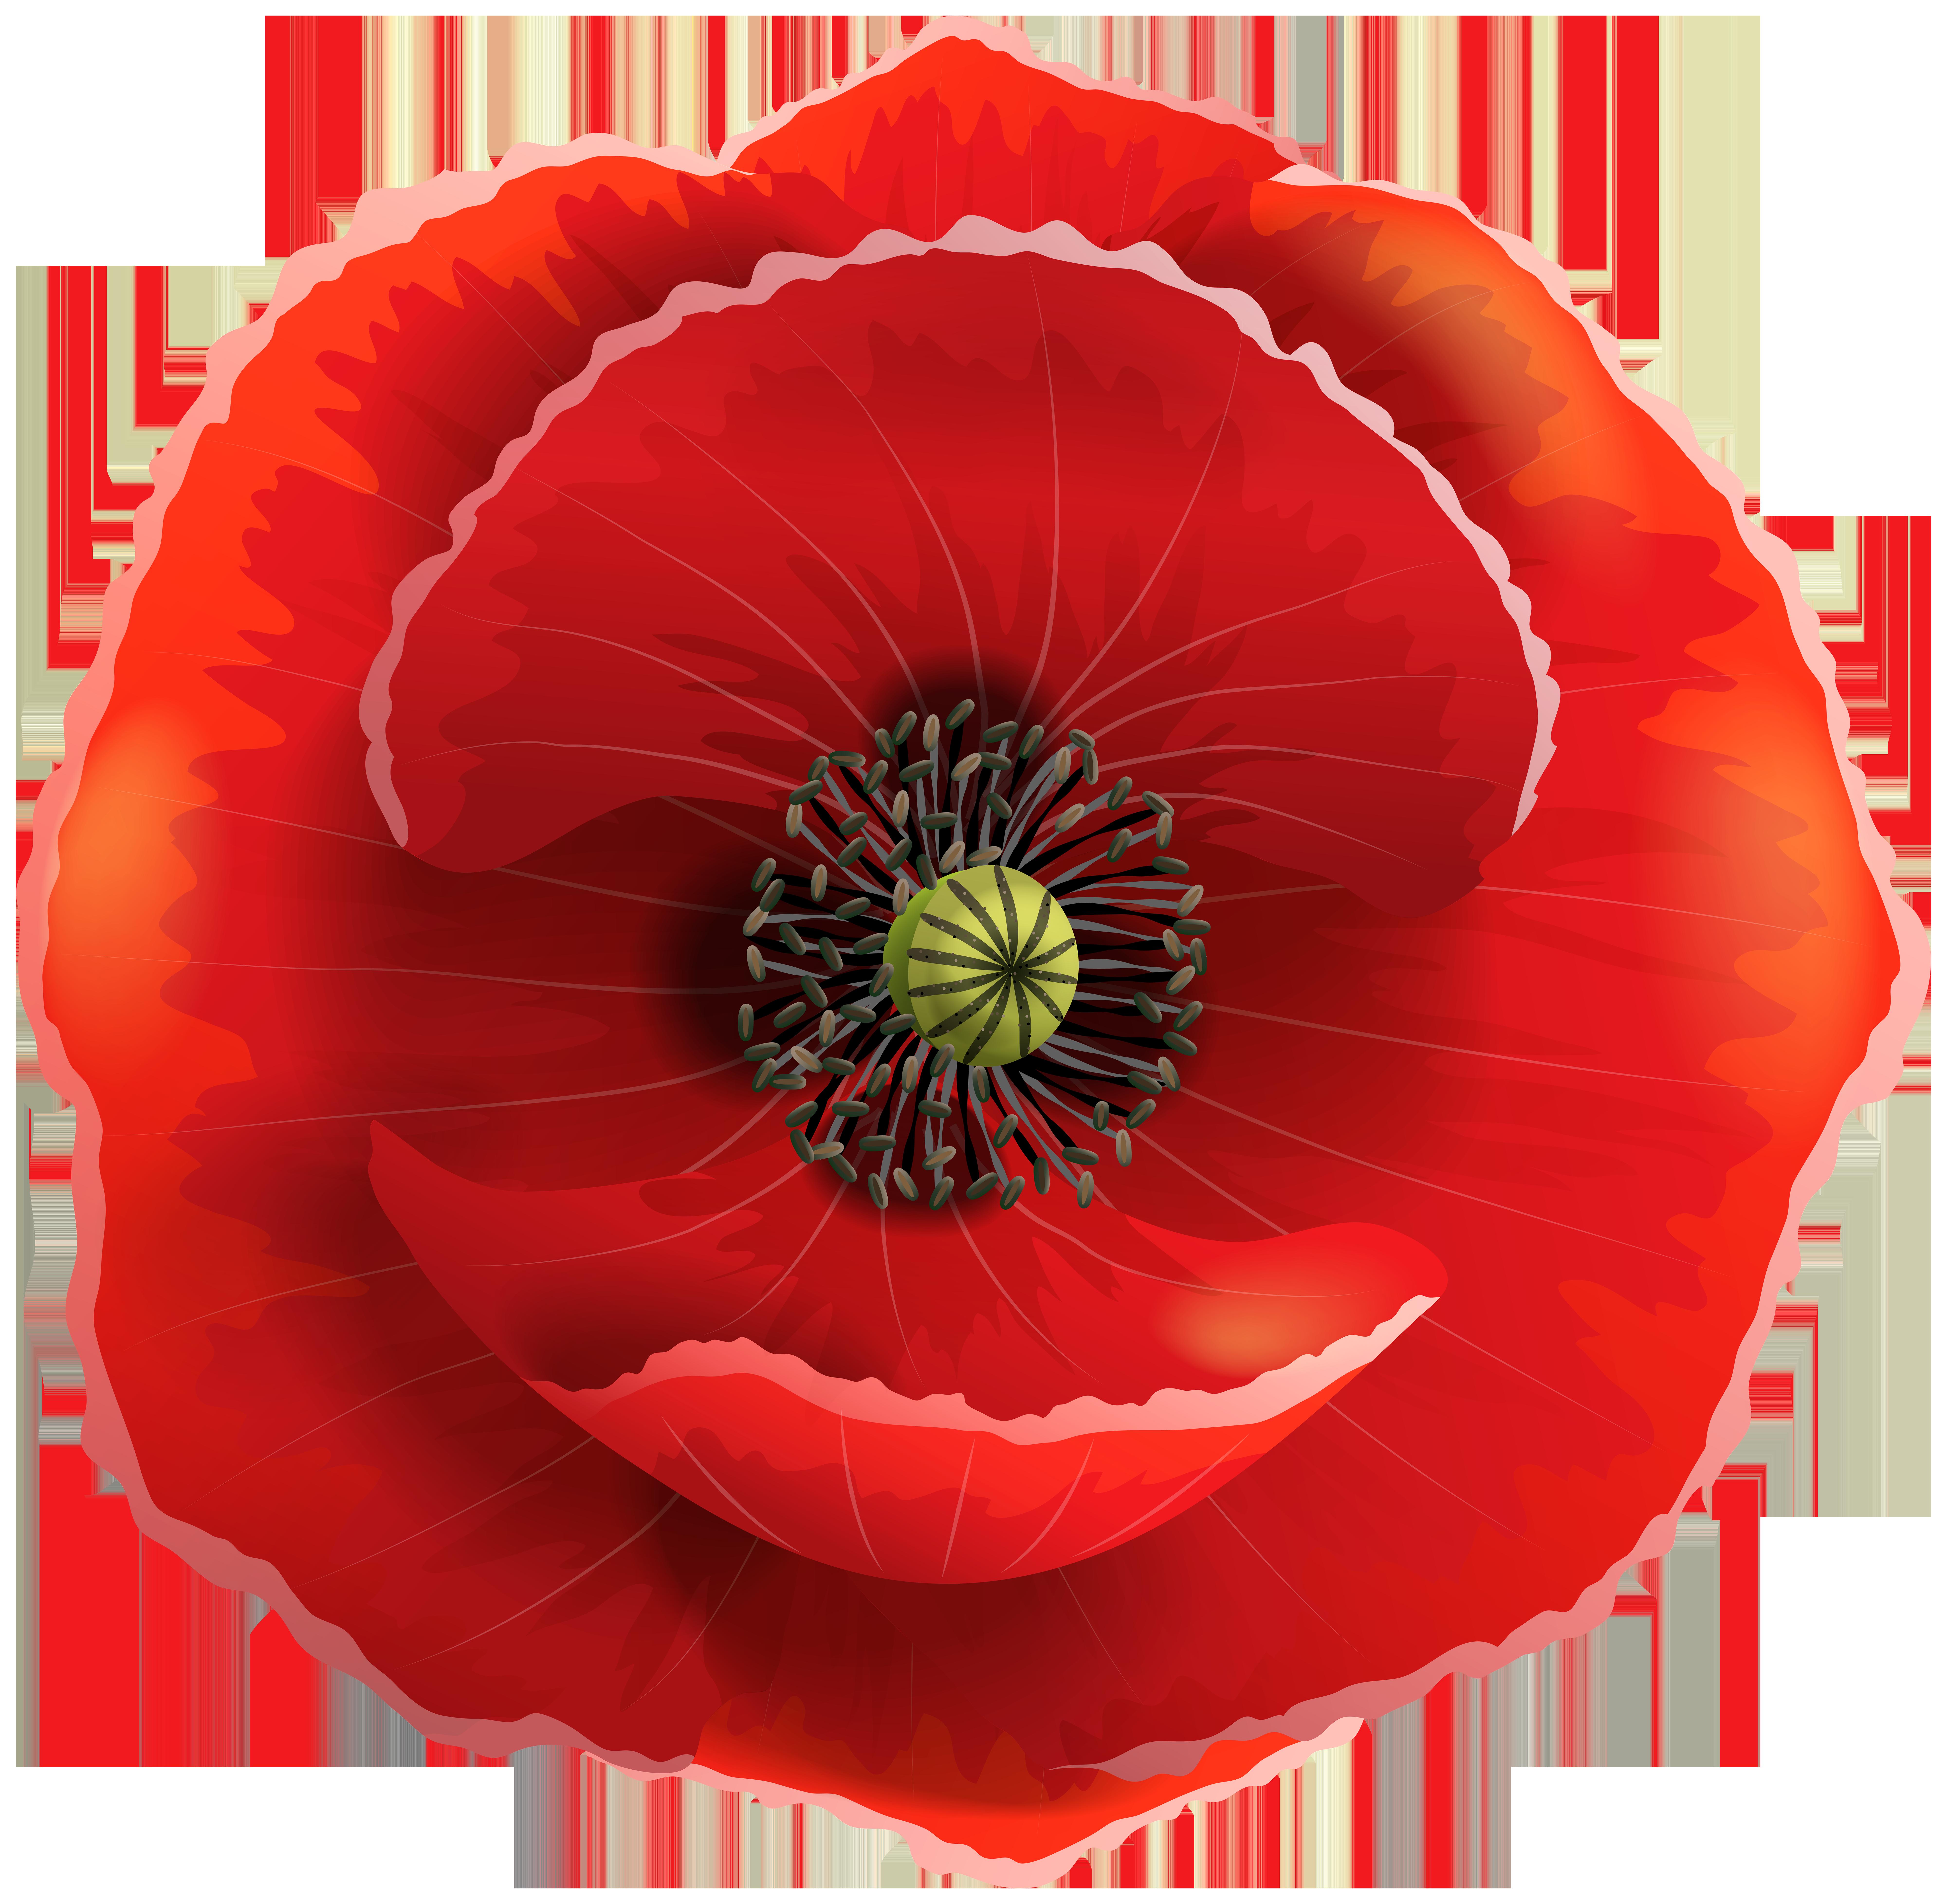 Transparent clip art image. Poppy flower png